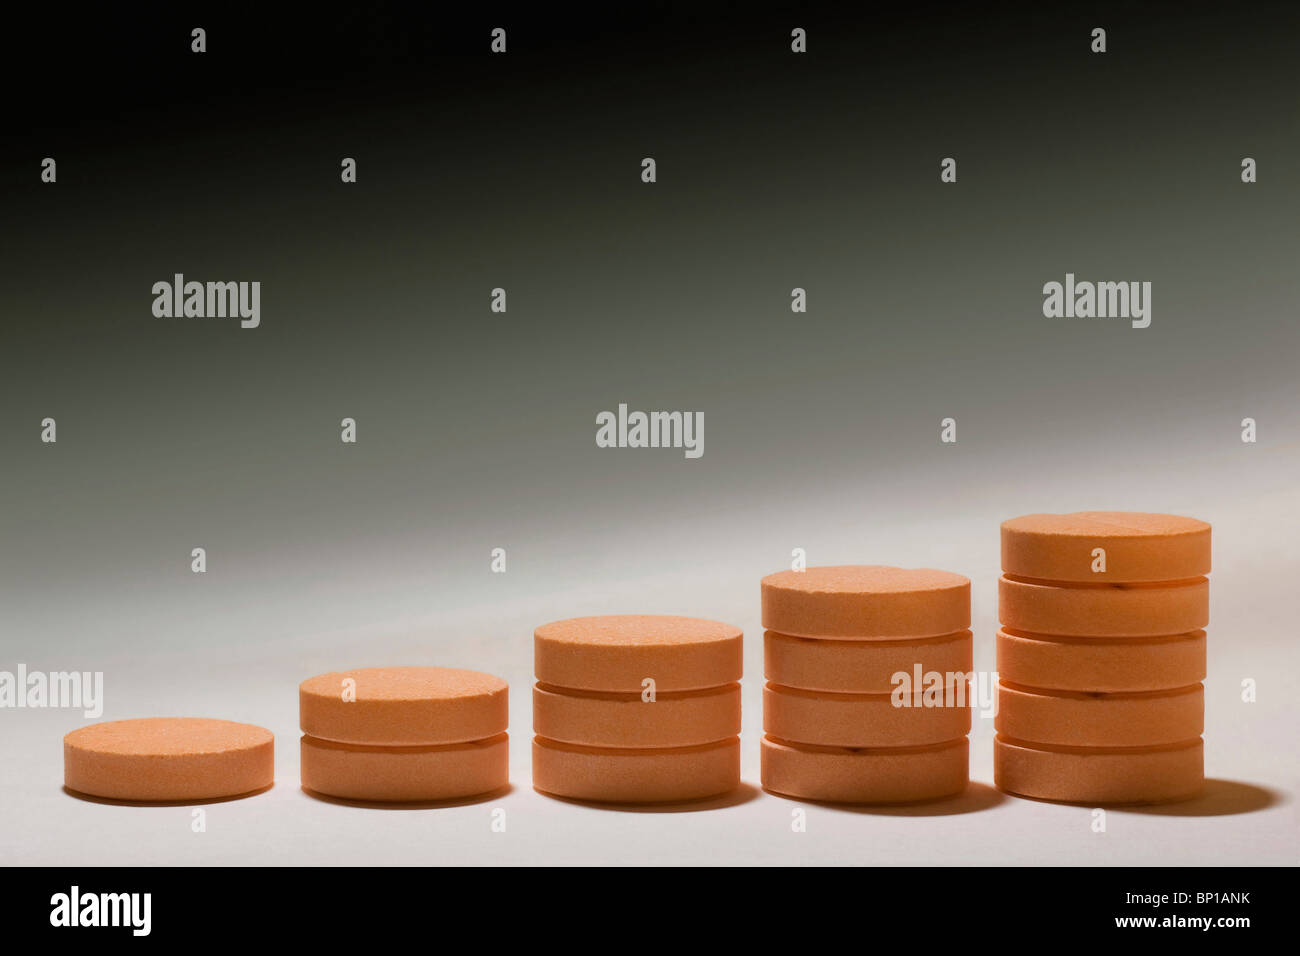 Vitamin C tablets - Stock Image